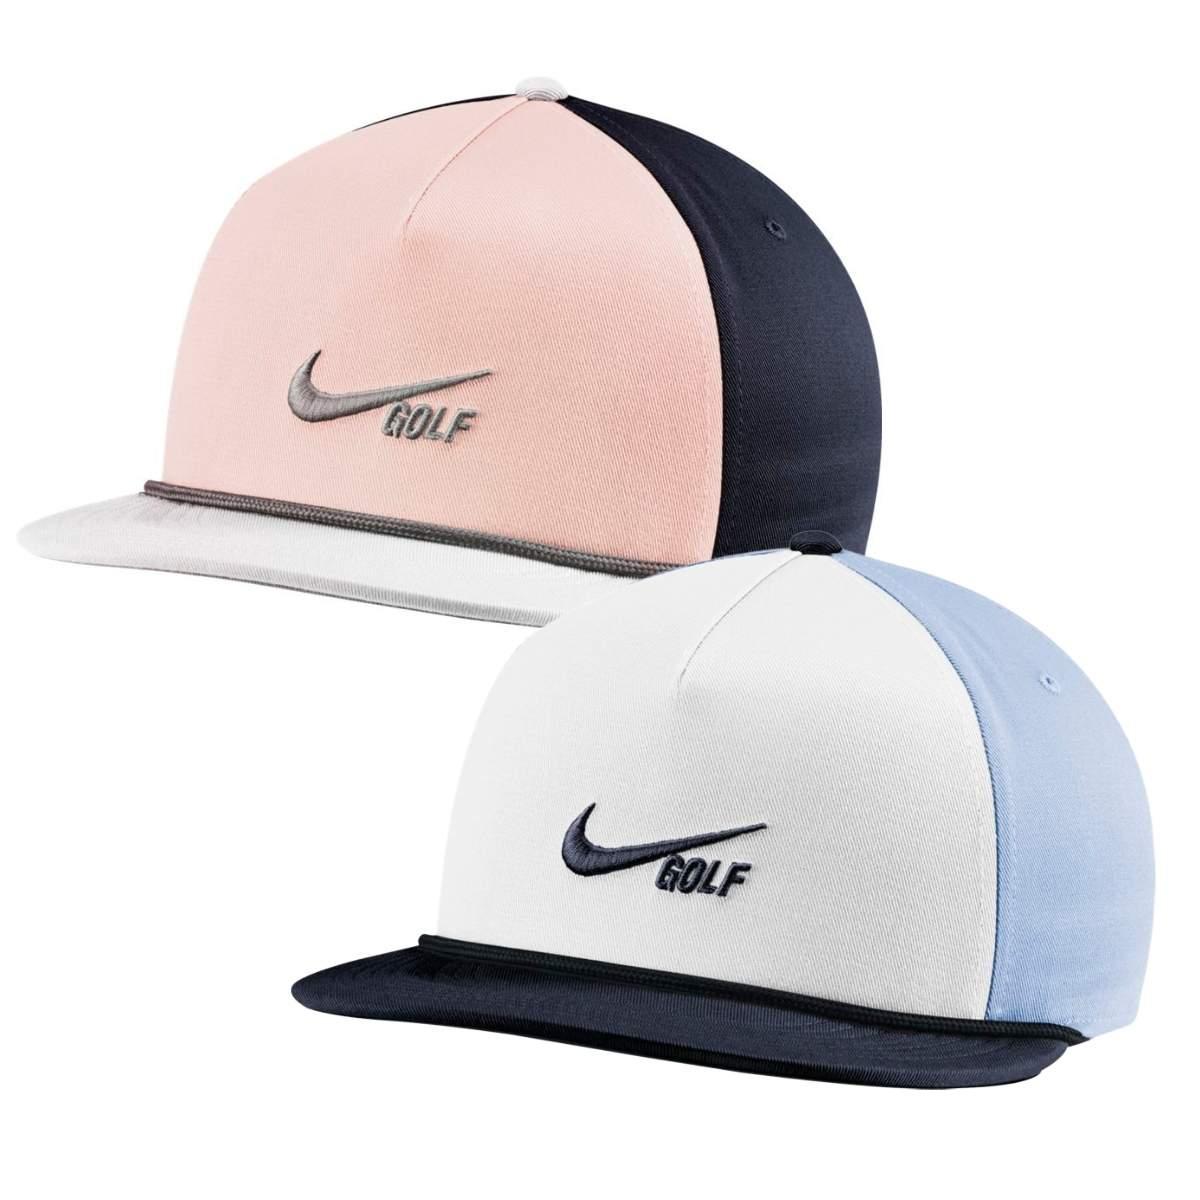 Nike Men's 2021 Aerobill Retro72 Players Golf Hat